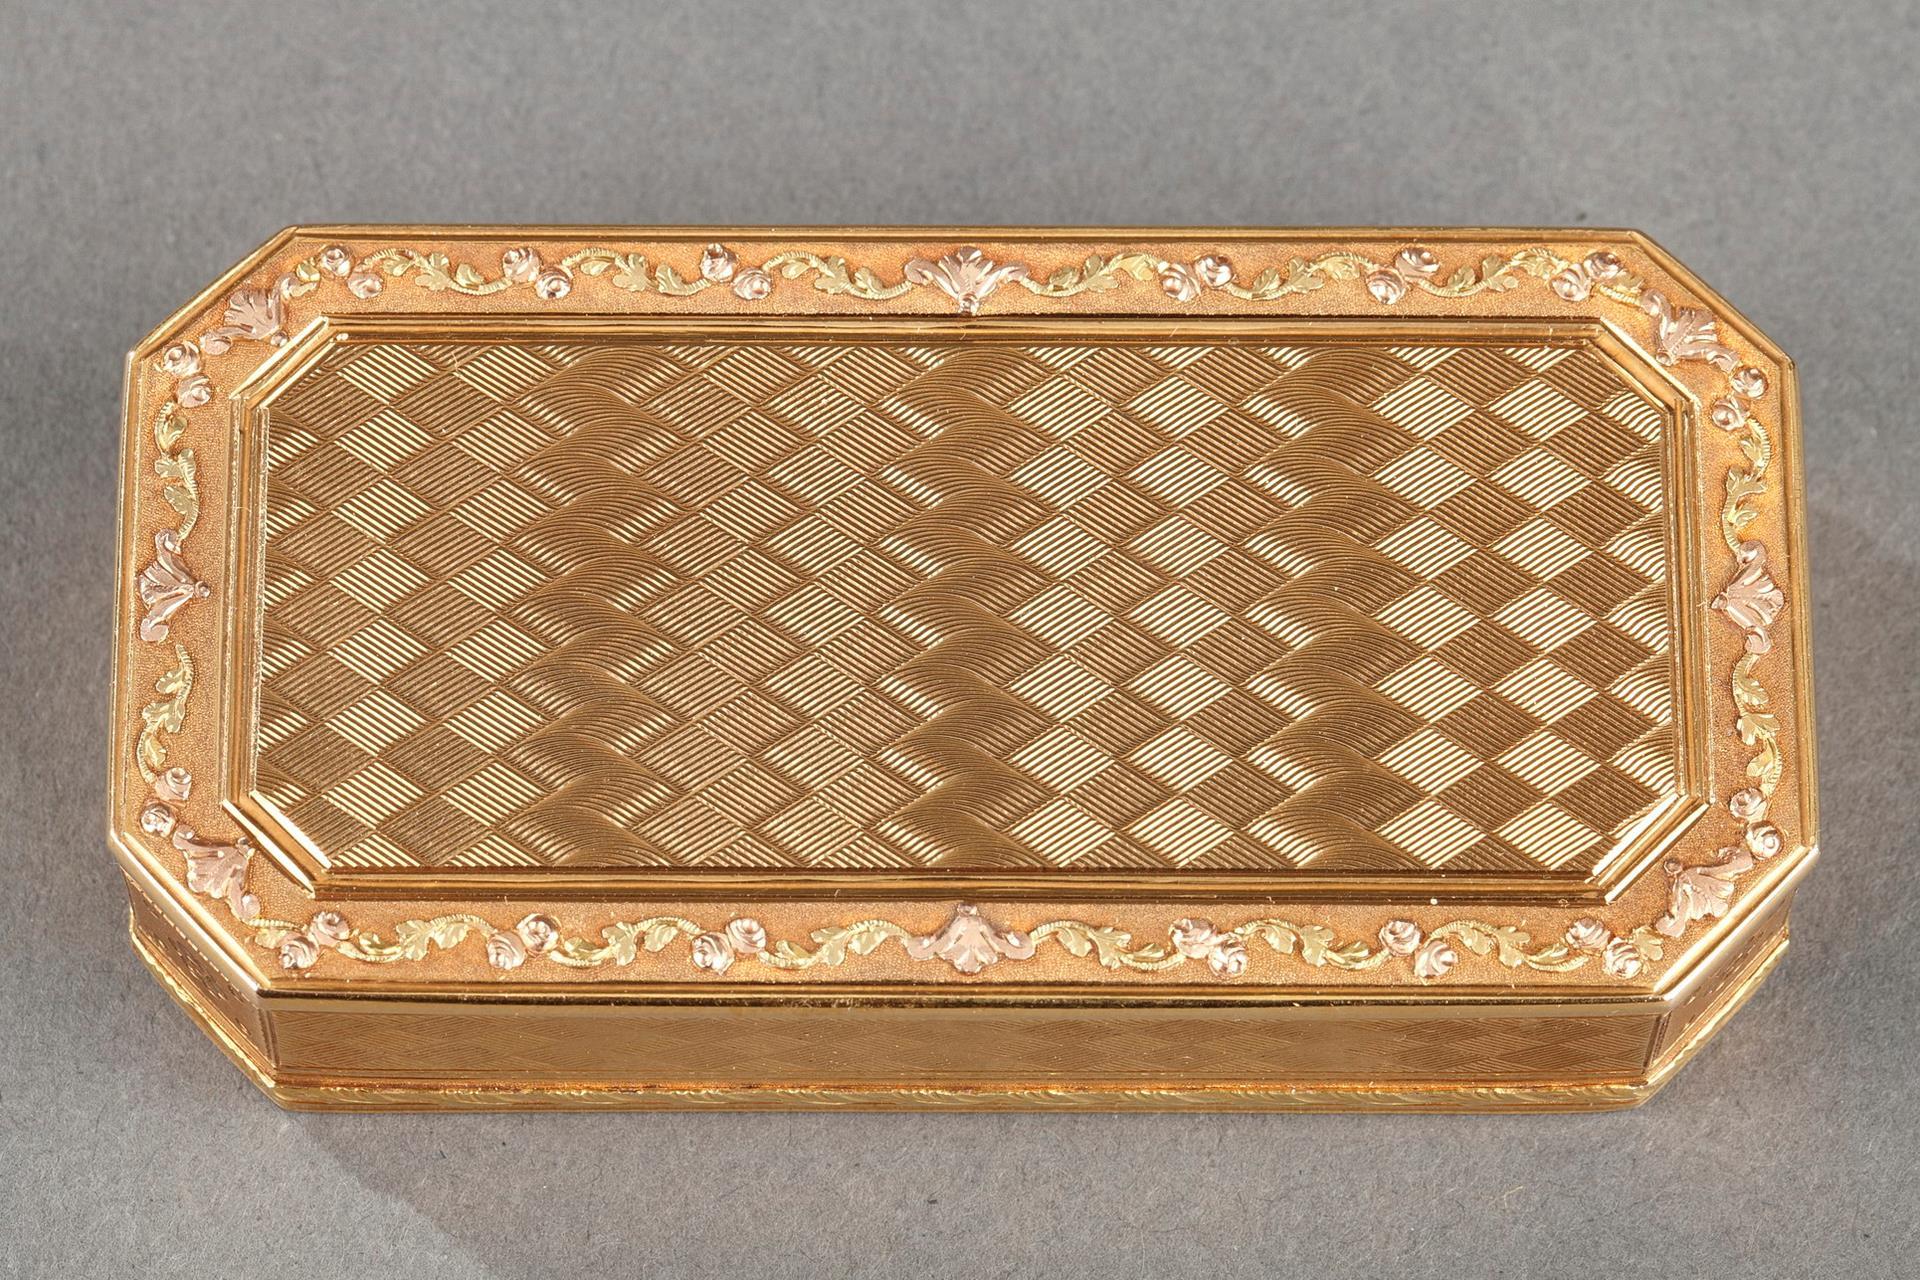 Gold Snuff box. Late 18th century.